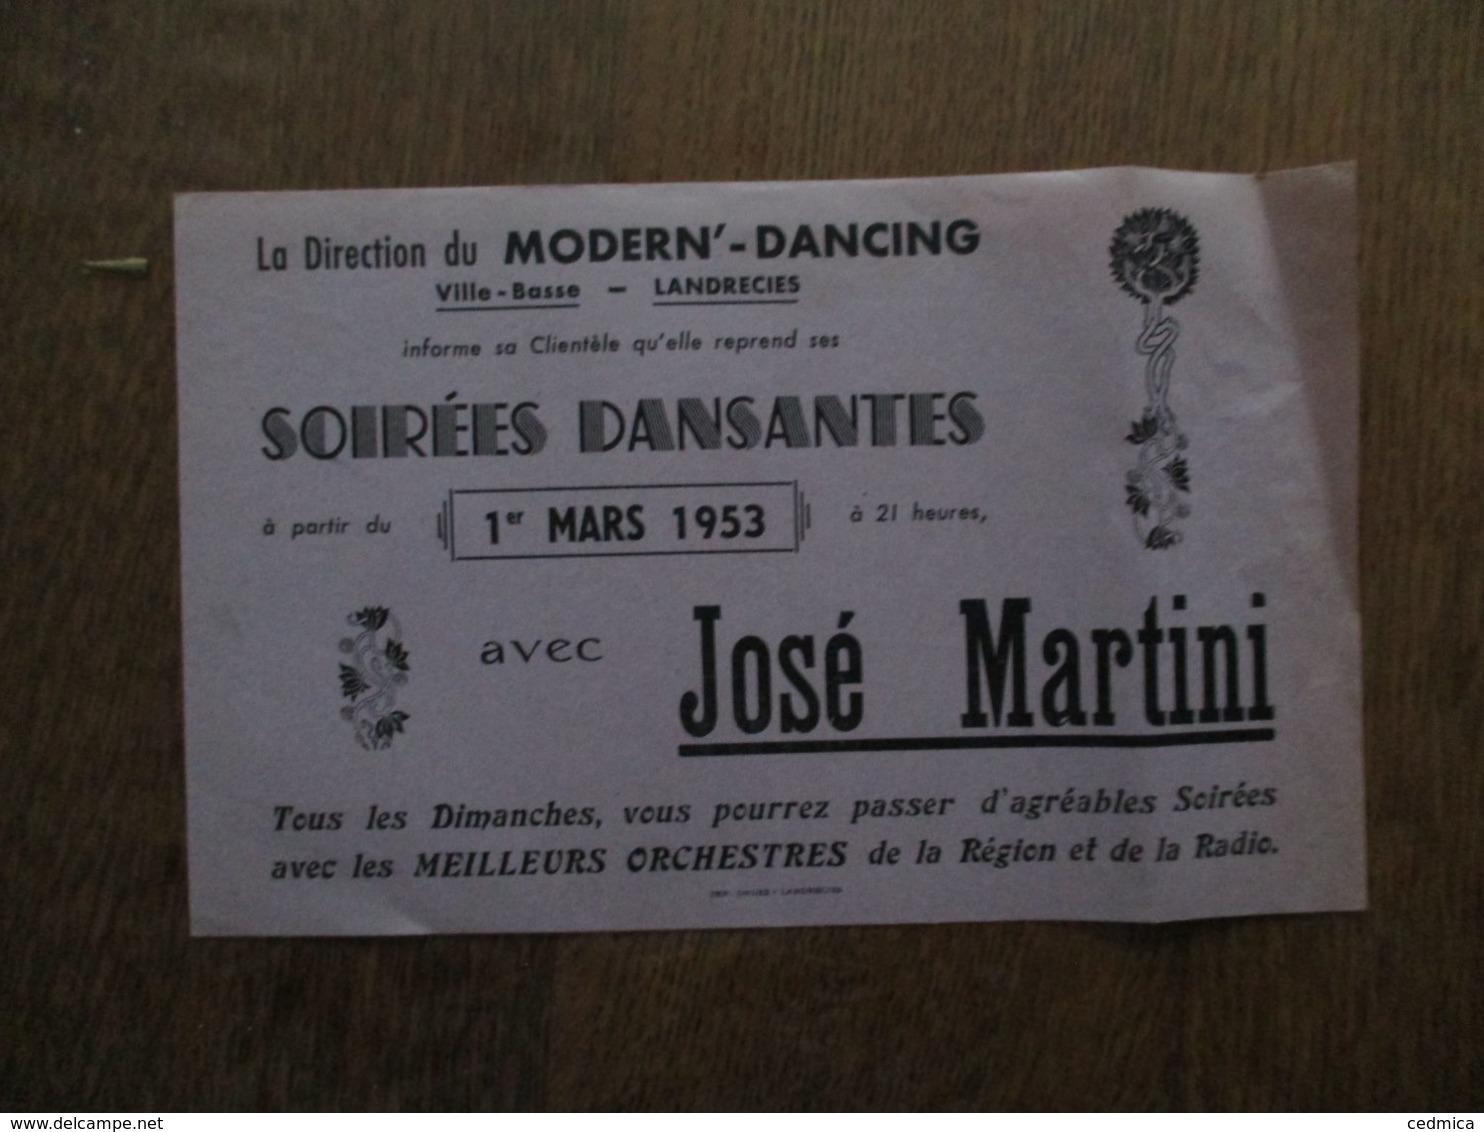 LANDRECIES LA DIRECTION DU MODERN'DANCING VILLE-BASSE INFORME SA CLIENTELE DE SES SOIREES DANSANTES A/C 1er MARS 1953 AV - Programmes